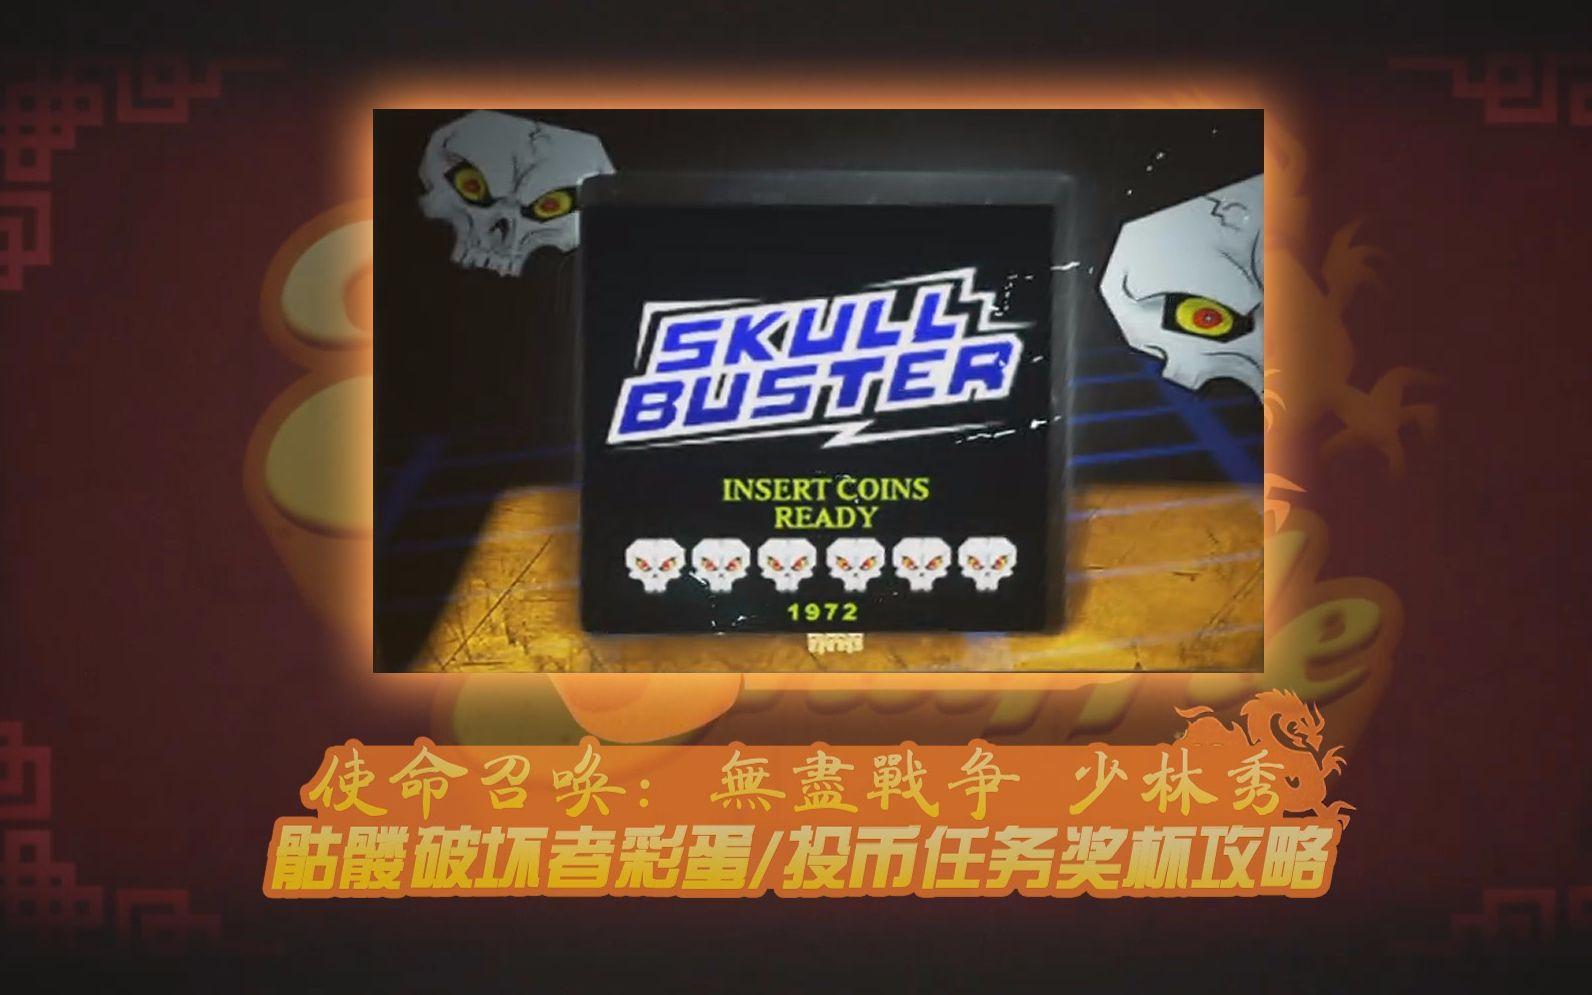 CODIW:Shaolin Shuffle 少林秀 骷髅破坏者彩蛋/投币任务奖杯攻略